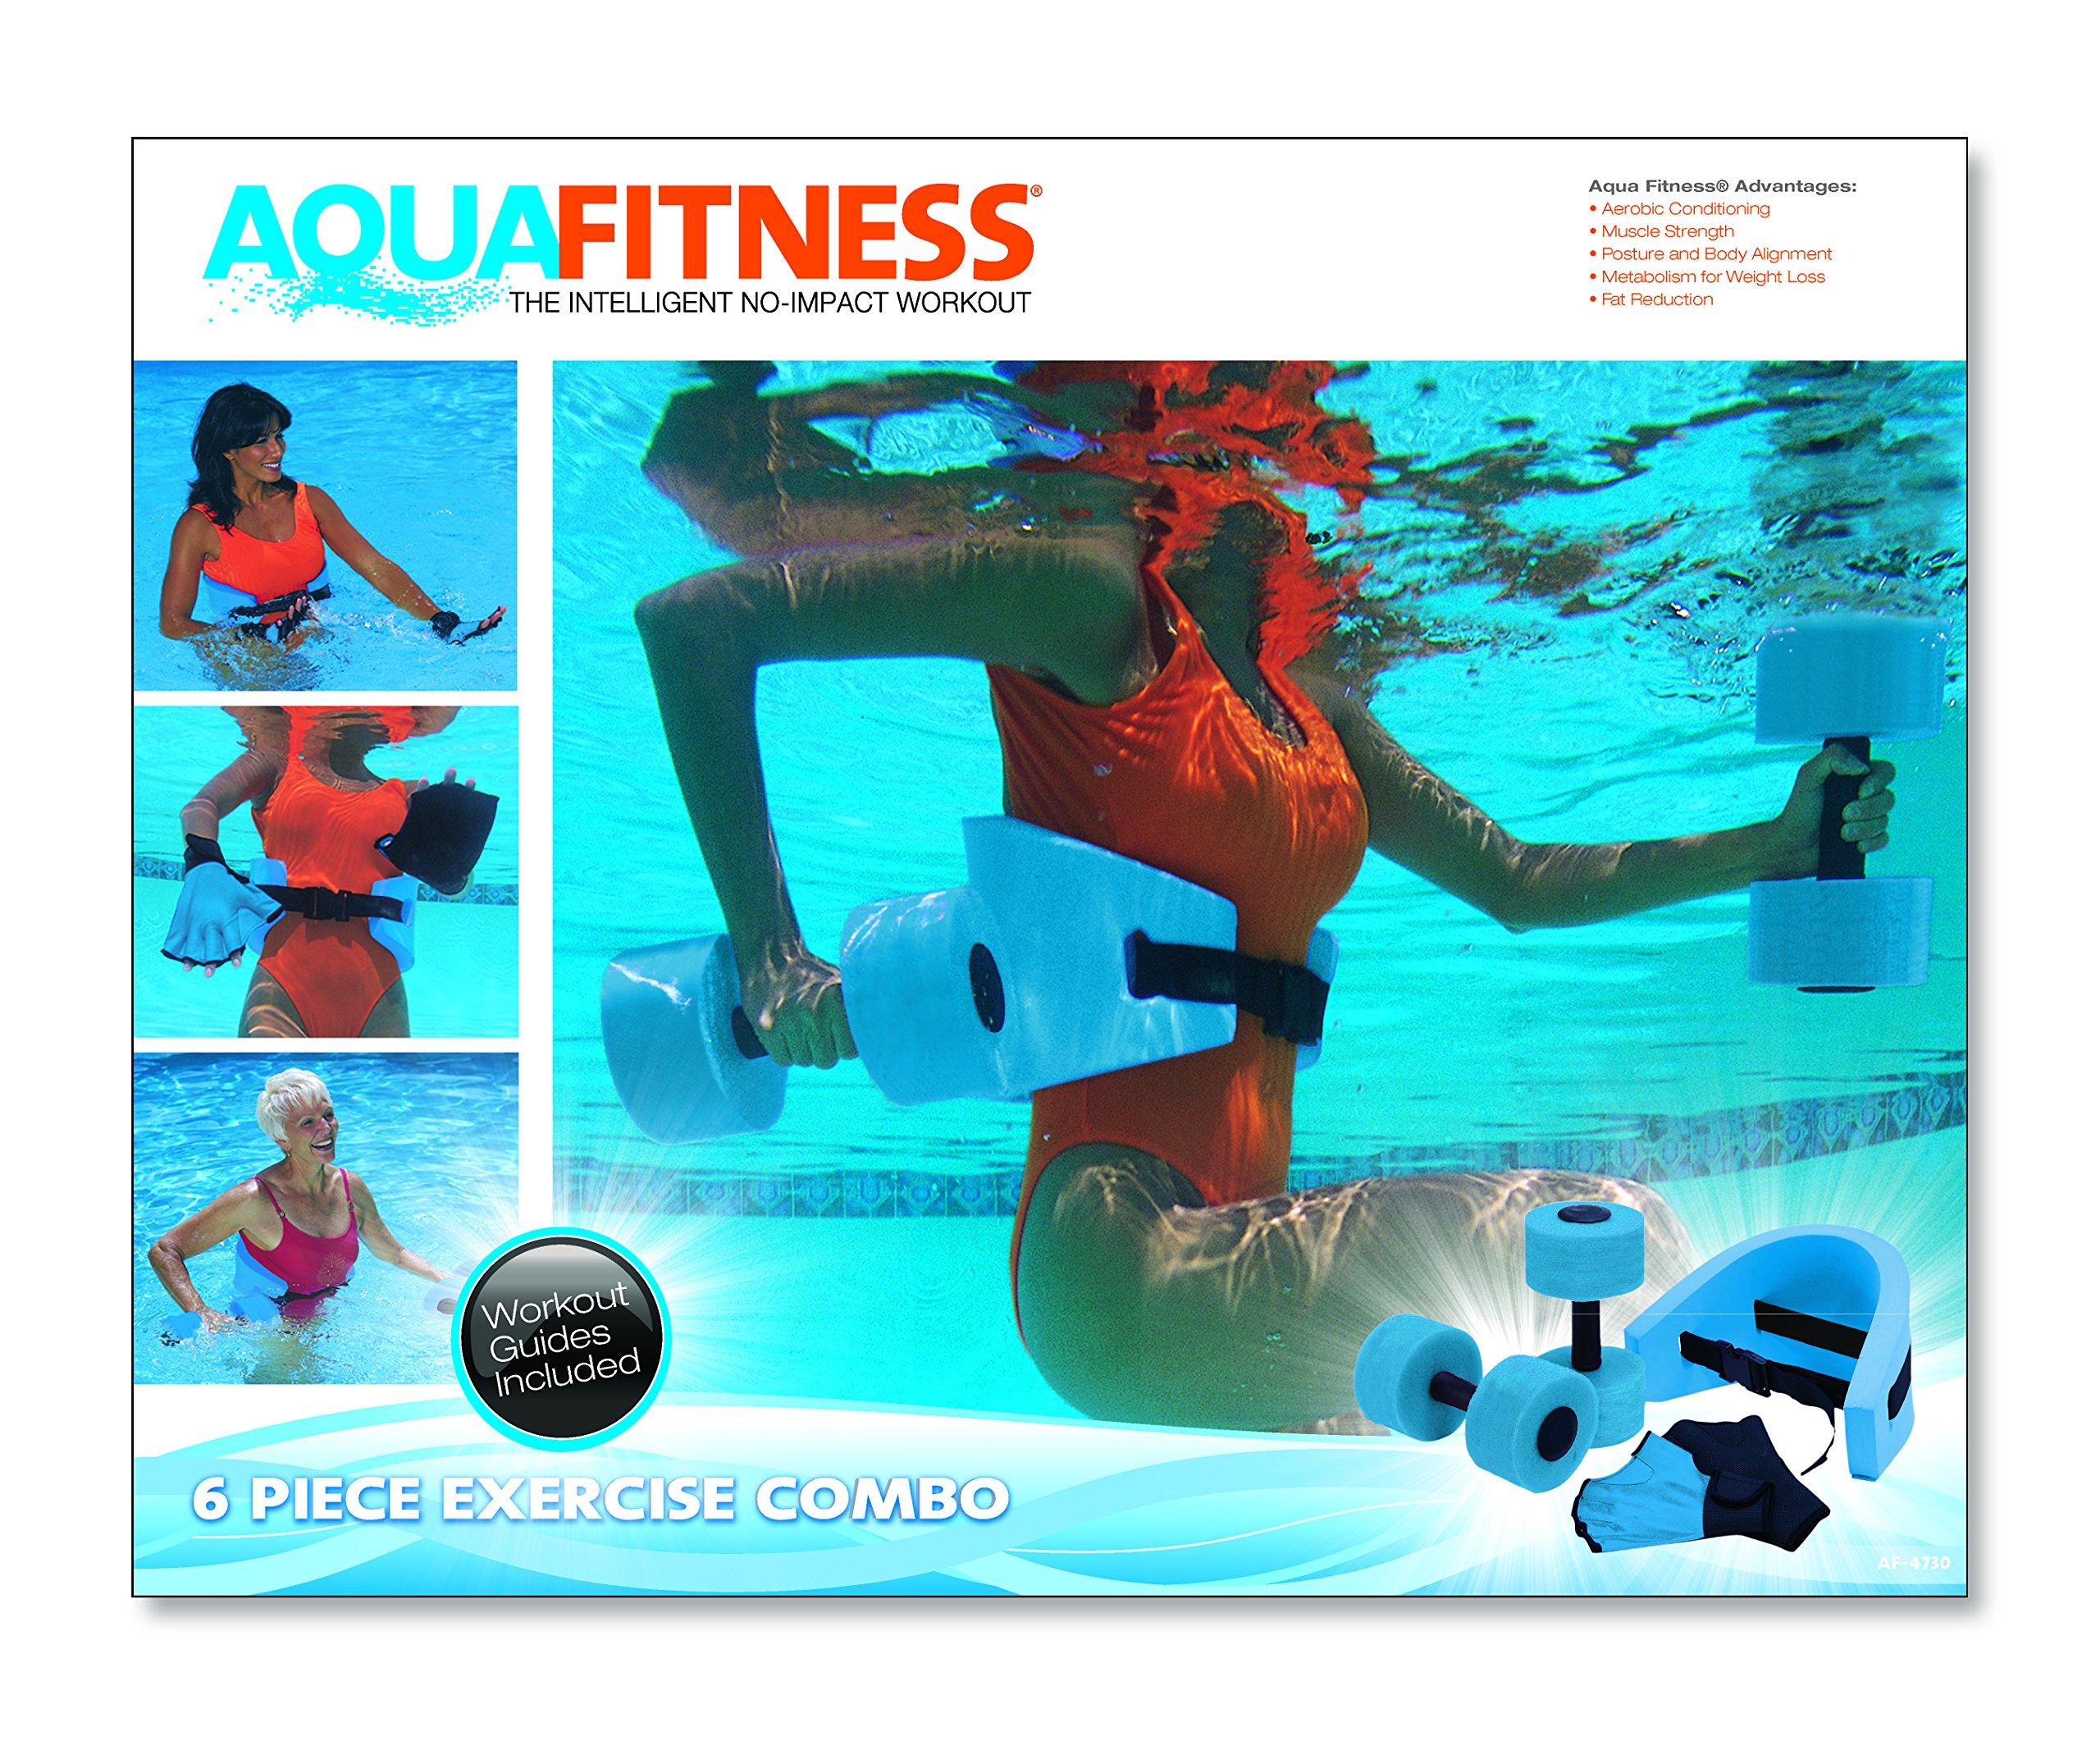 Aqua fitness exercise set 6 piece set water workout and aerobics floata ebay for Flotation belt swimming pool exercise equipment